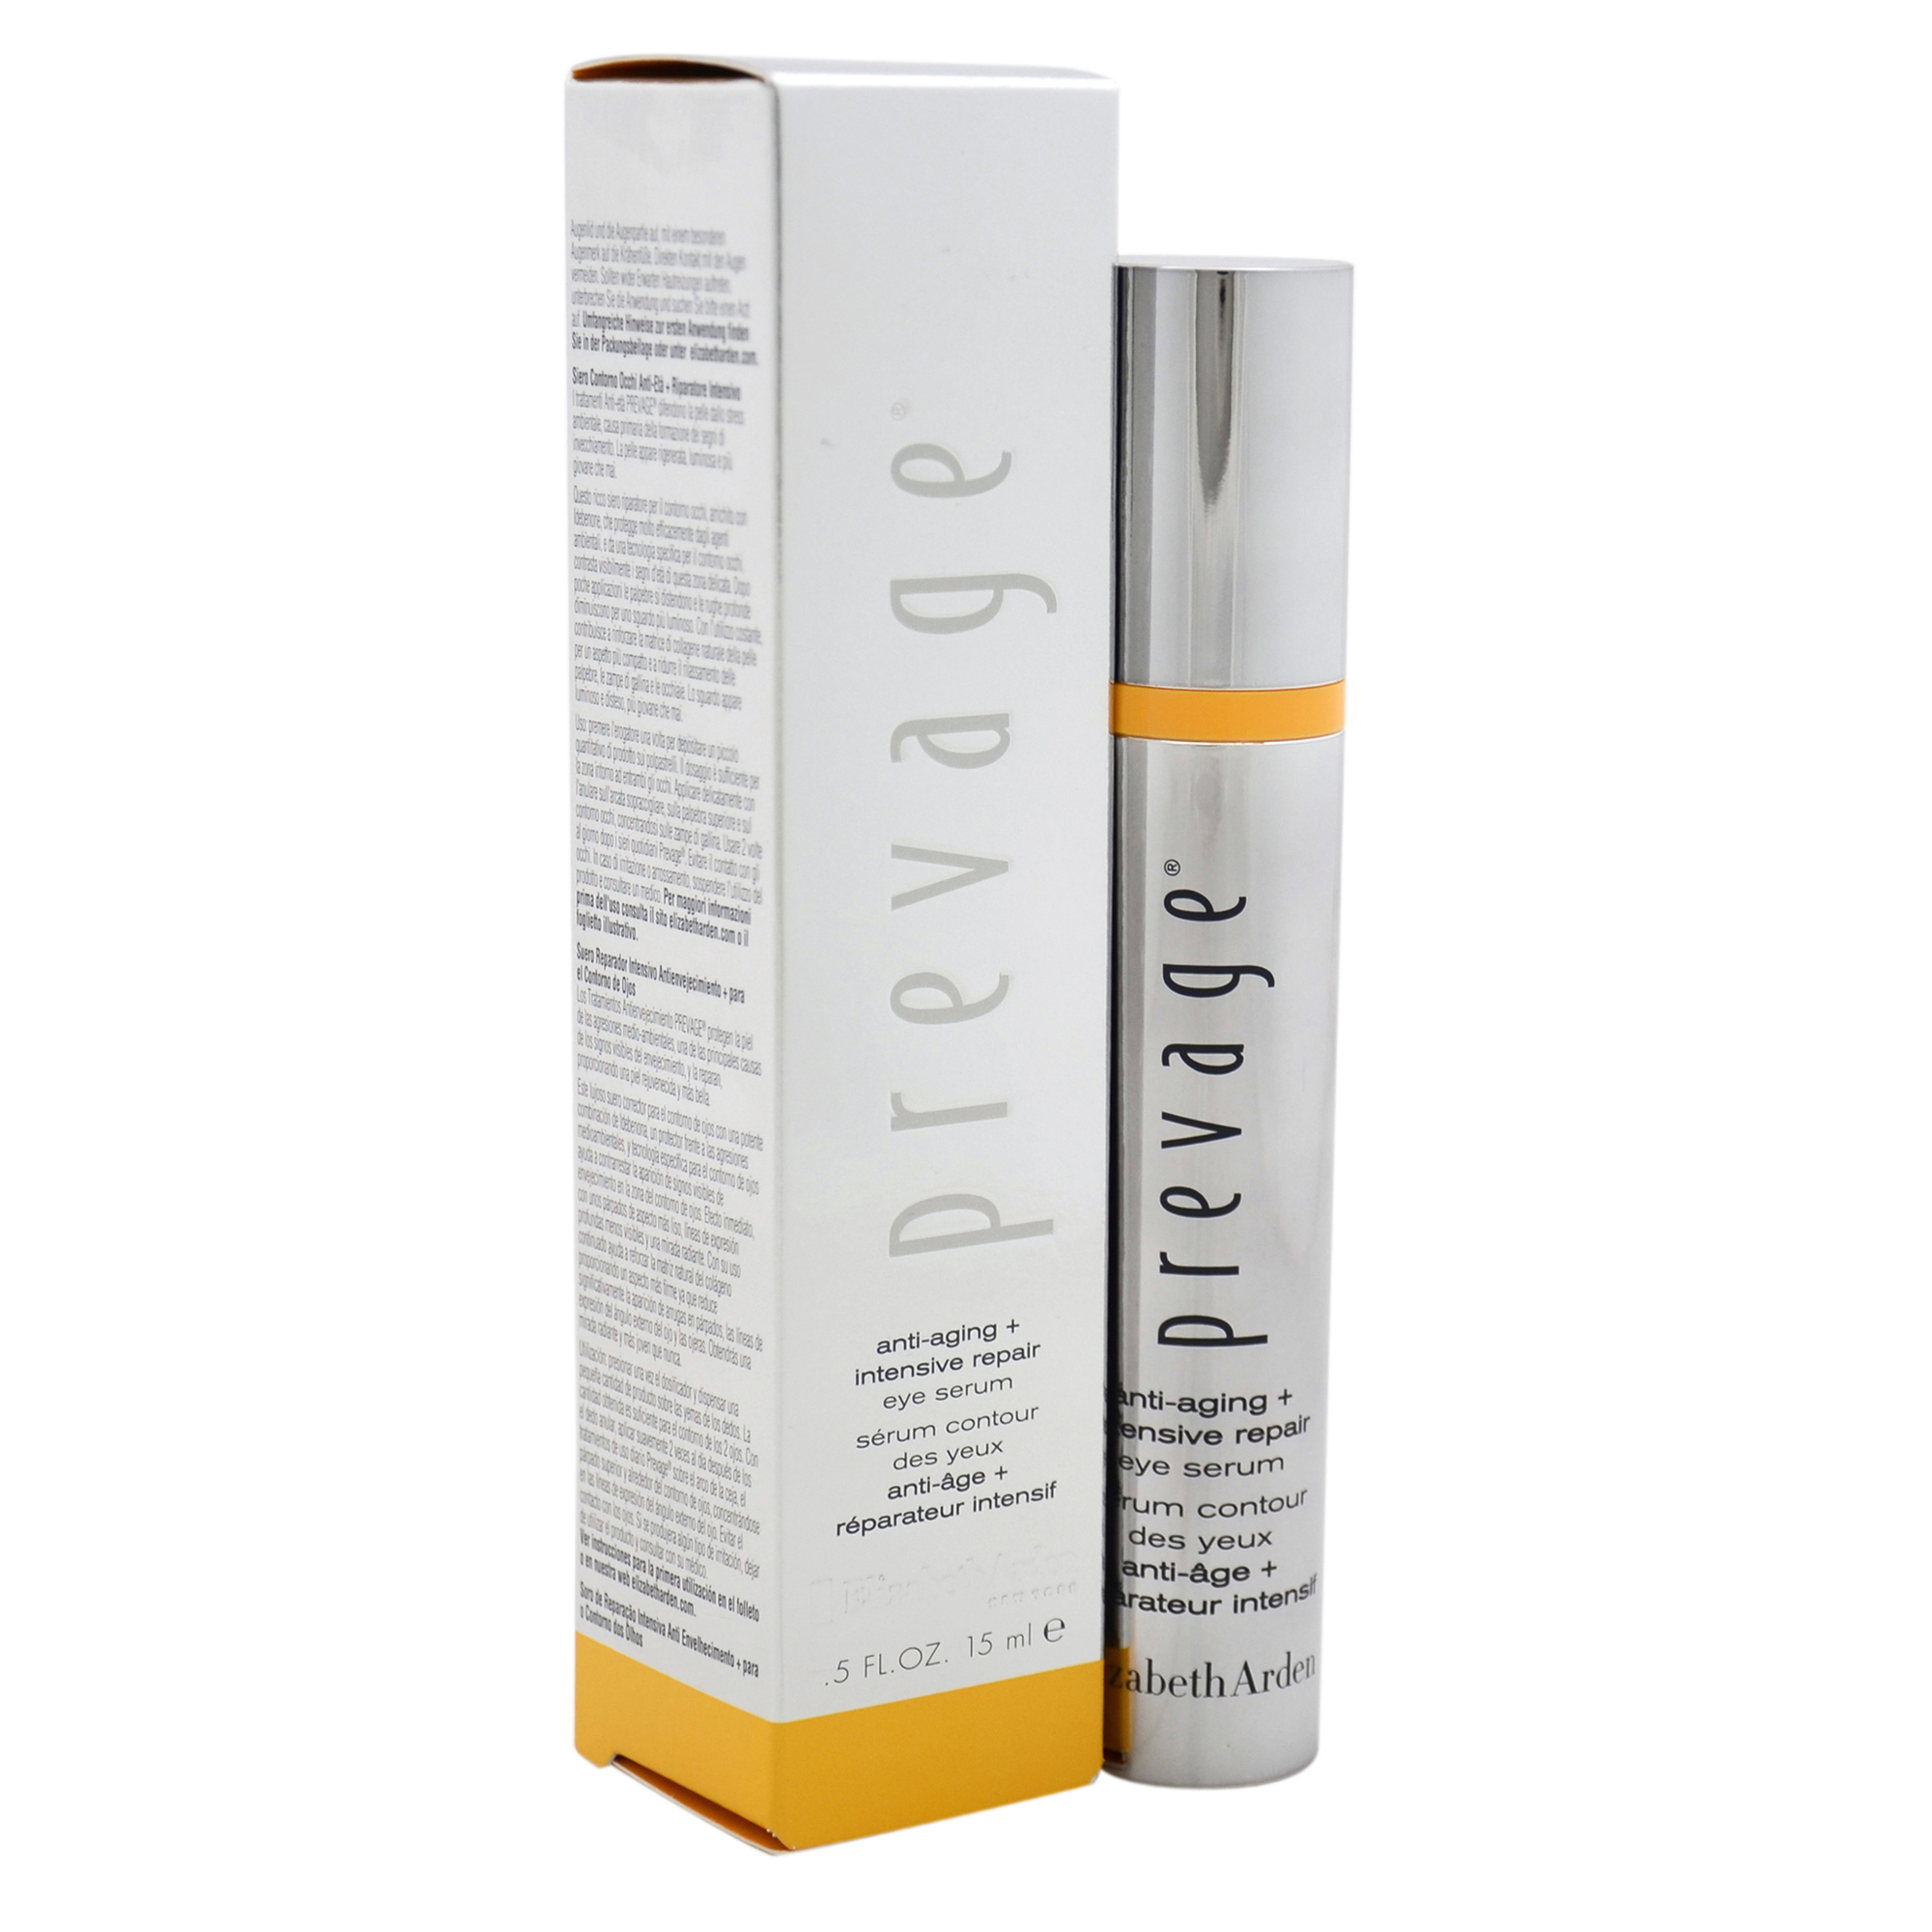 Prevage Anti-Aging + Intensive Repair Eye Serum by Elizabeth Arden for Women - 0.5 oz Serum